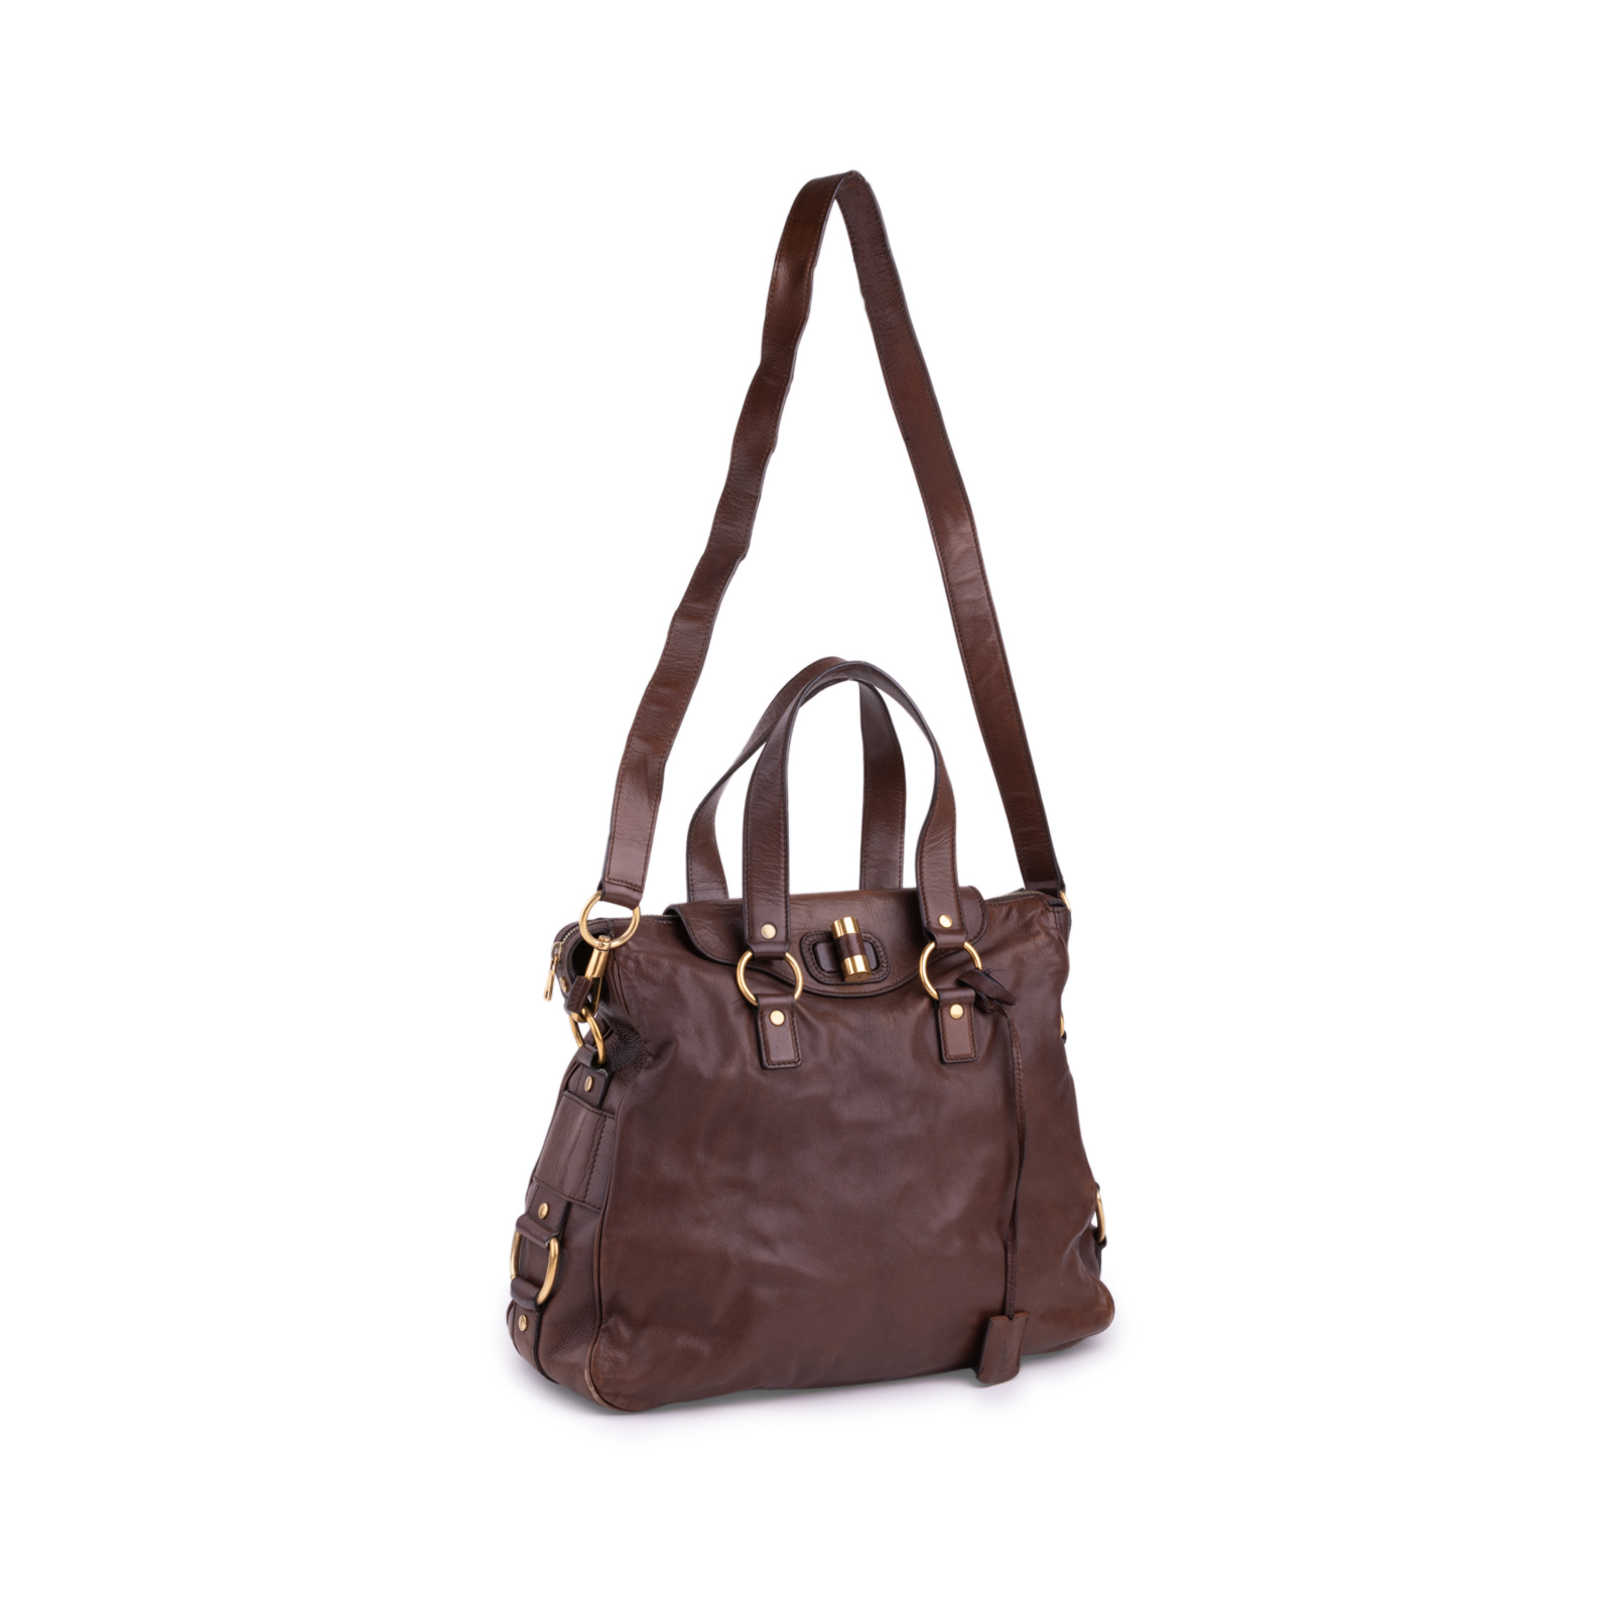 74138a1d477 ... Authentic Second Hand Yves Saint Laurent Muse Messenger Bag  (PSS-521-00019) ...